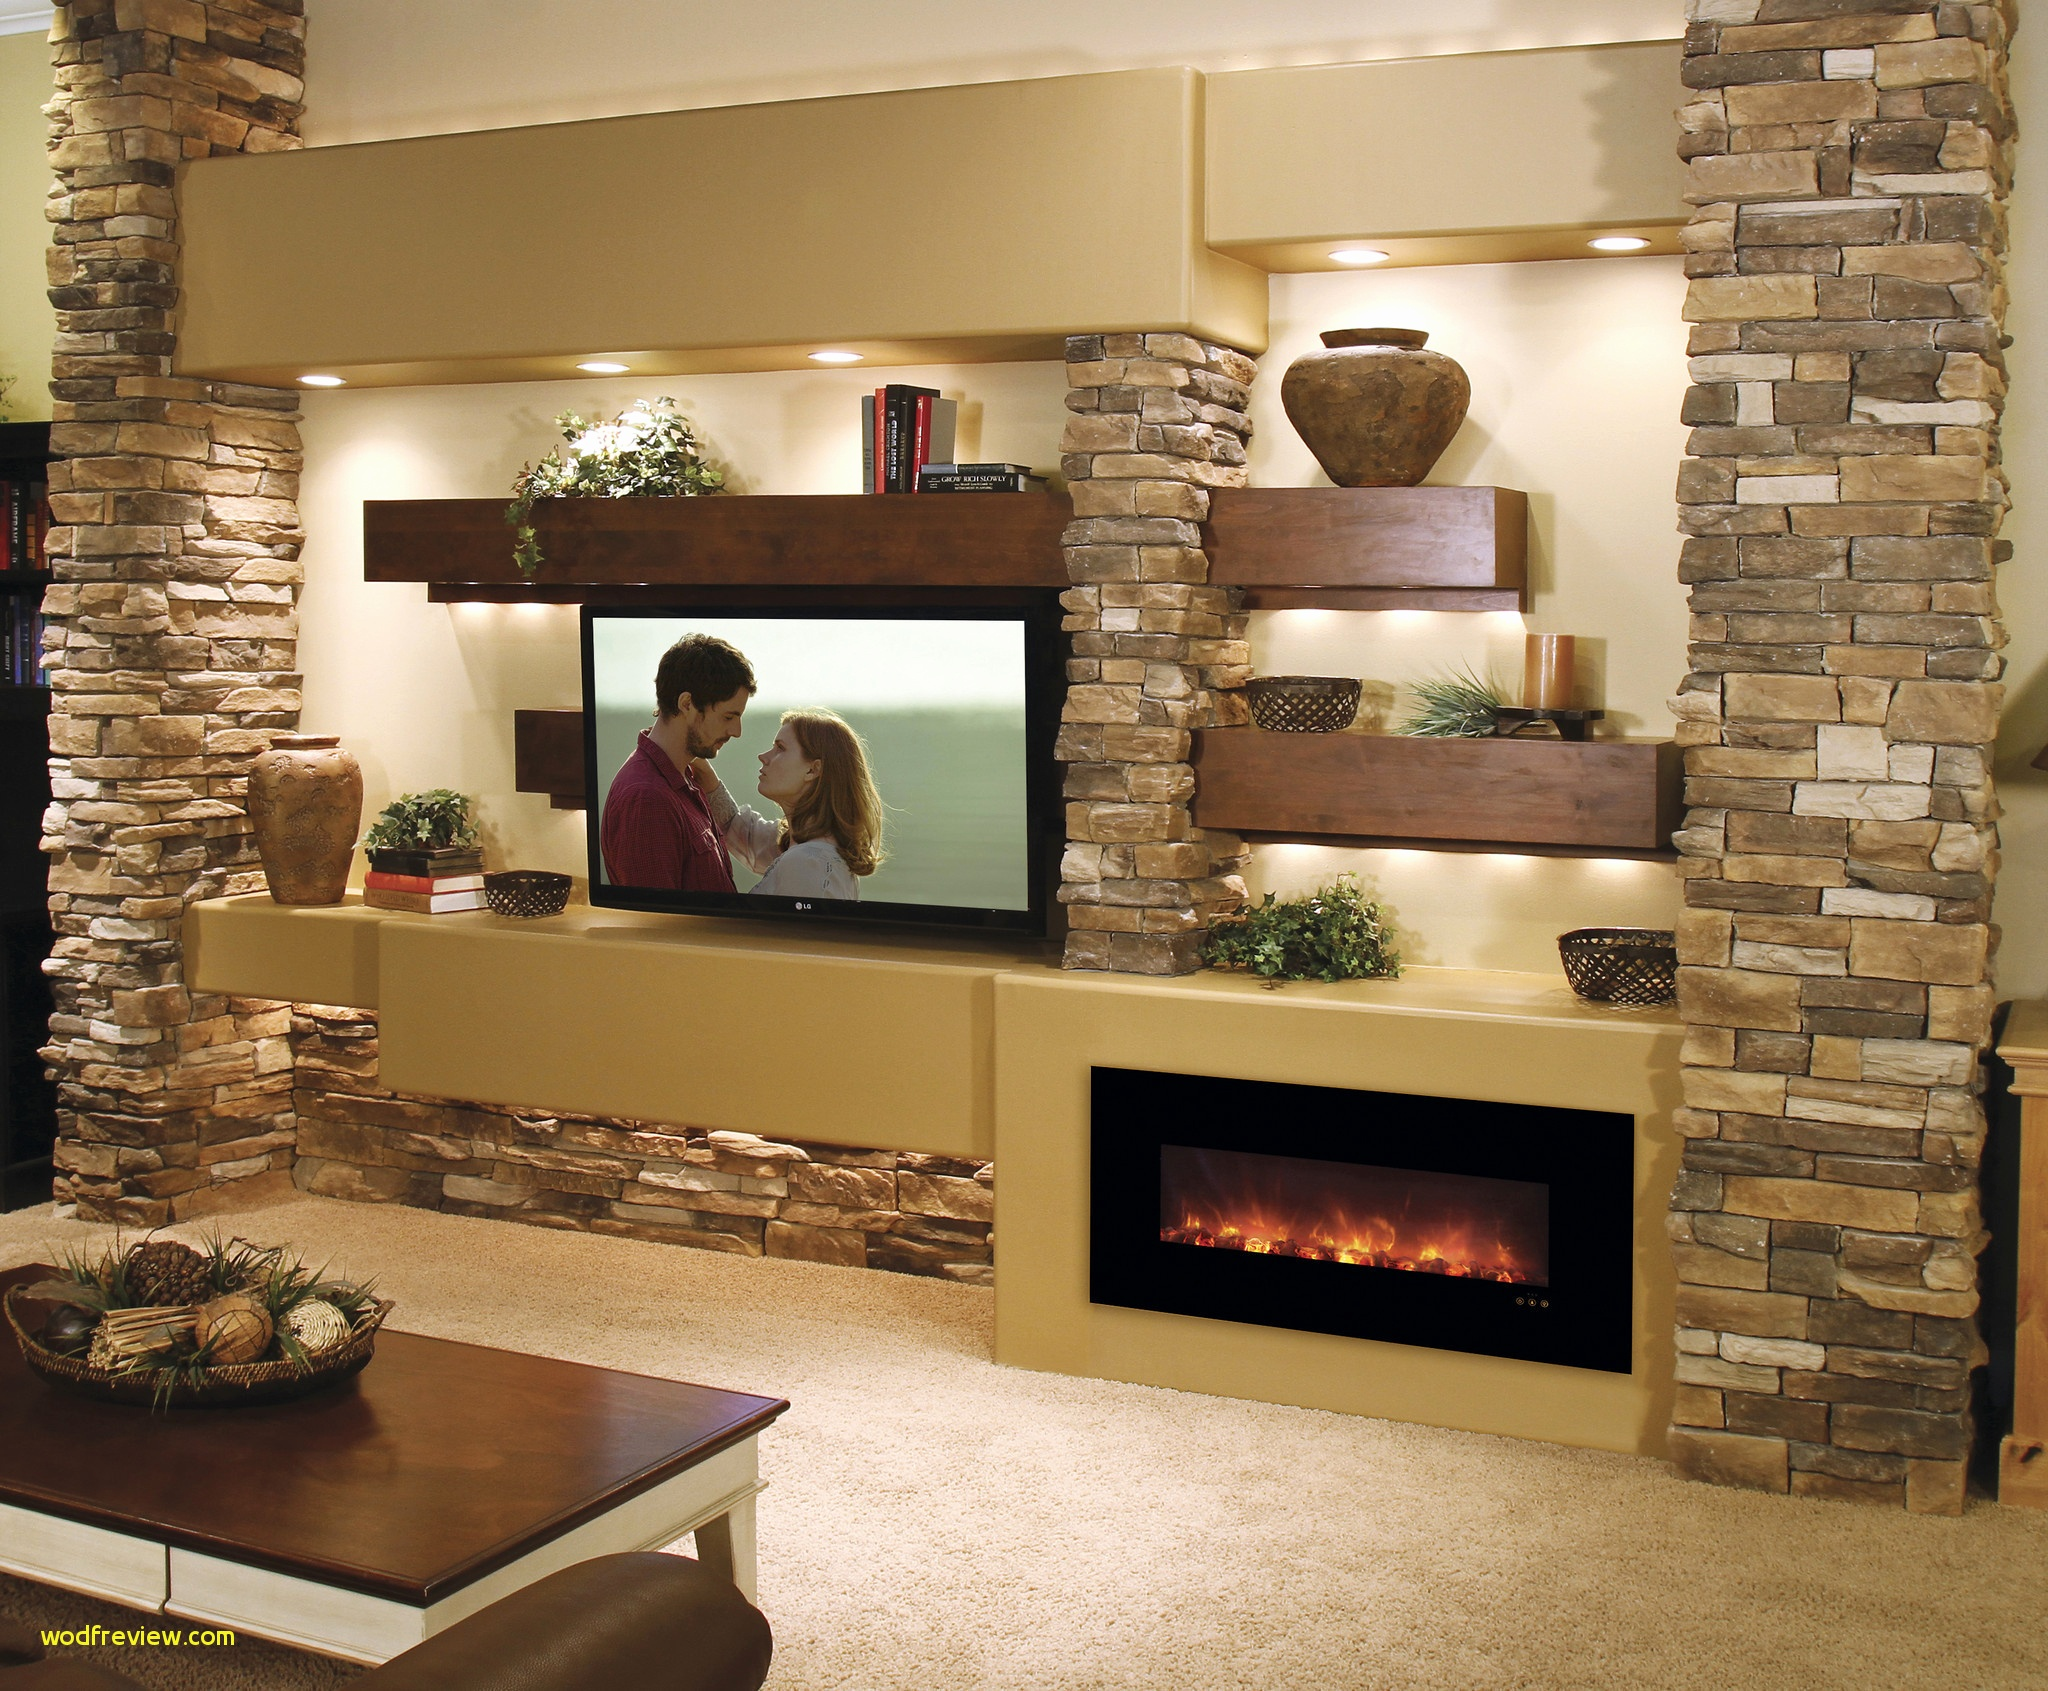 34 living room layout most inspiring living room design unique tag fireplace 0d neutral color shelves end of living room layout